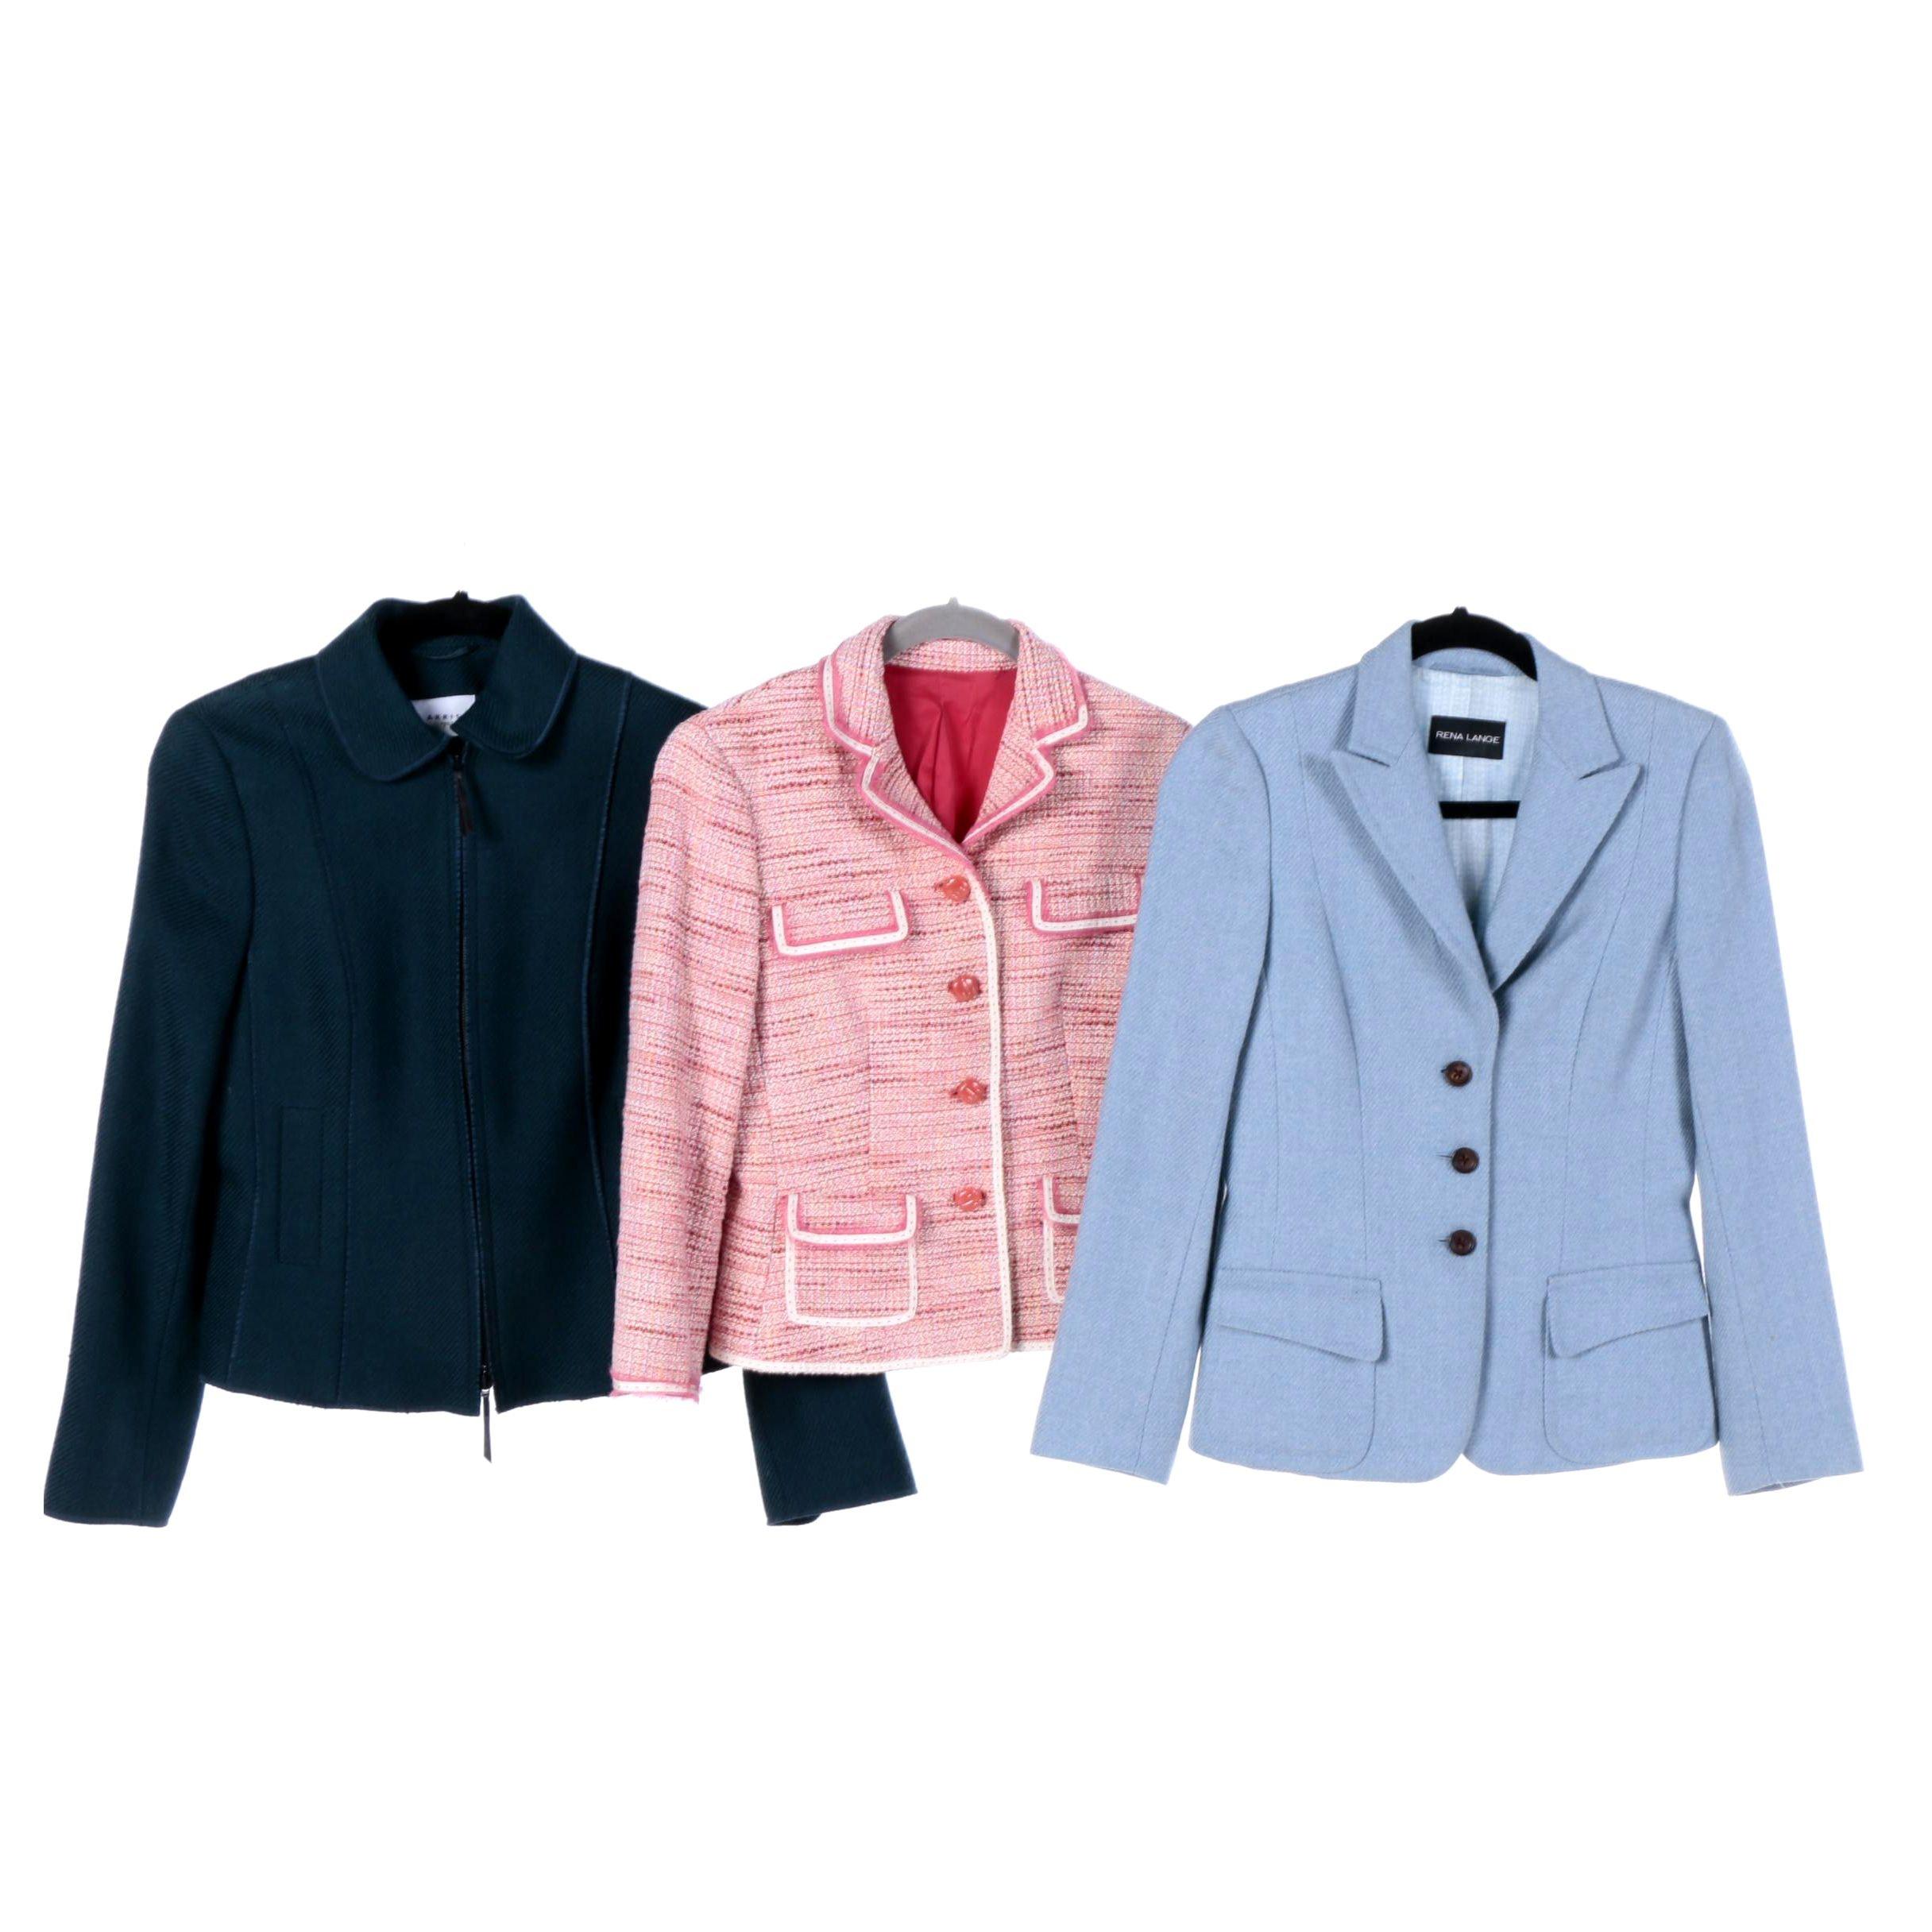 Rena Lang, Elie Tahari, and Akris Punto Blazer Jackets